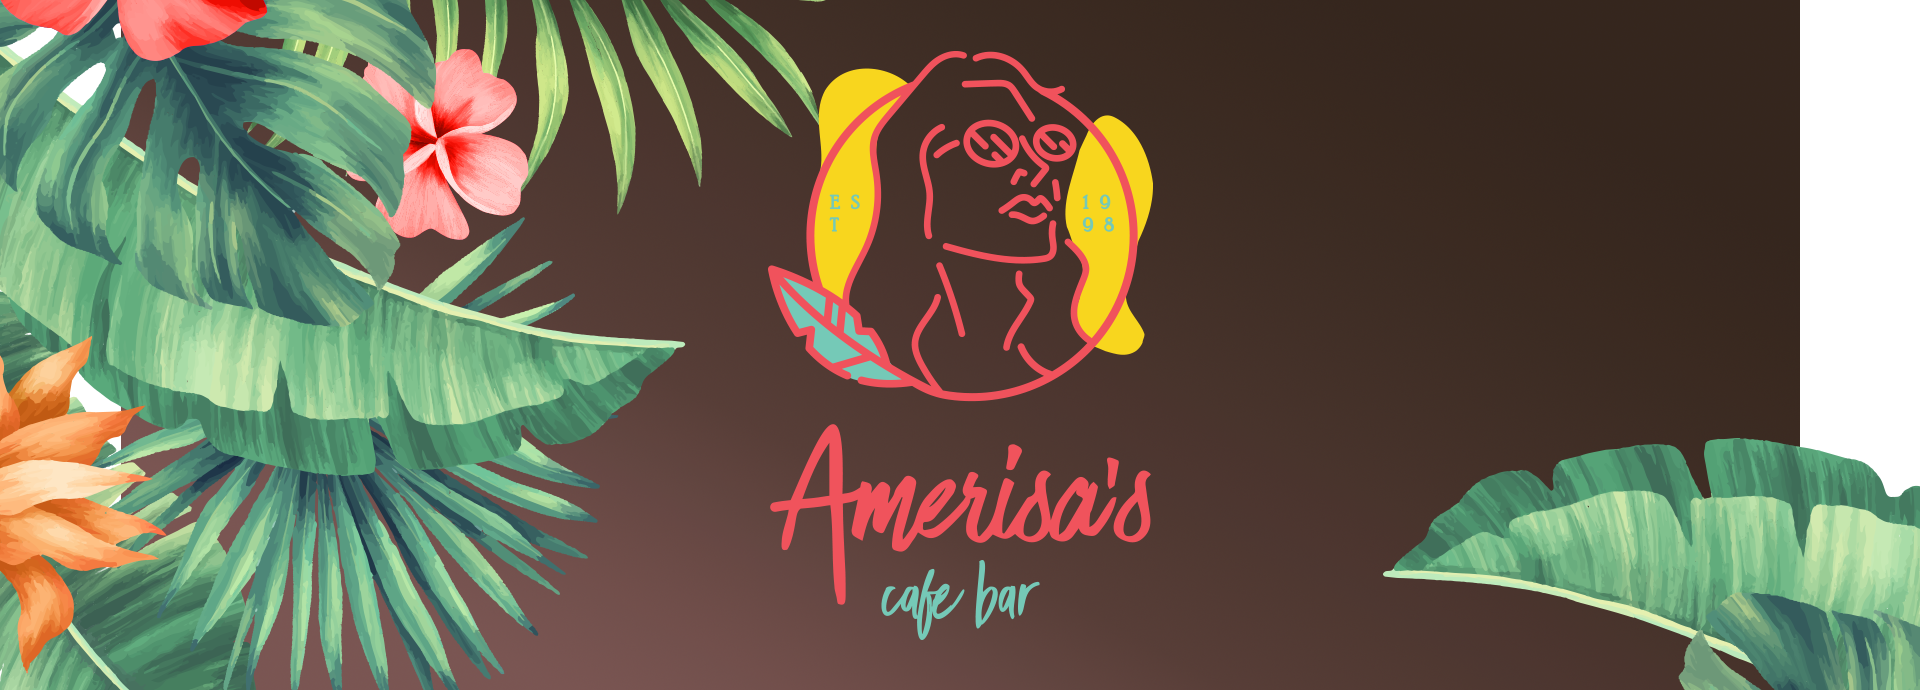 Amerisa's Cafe Bar